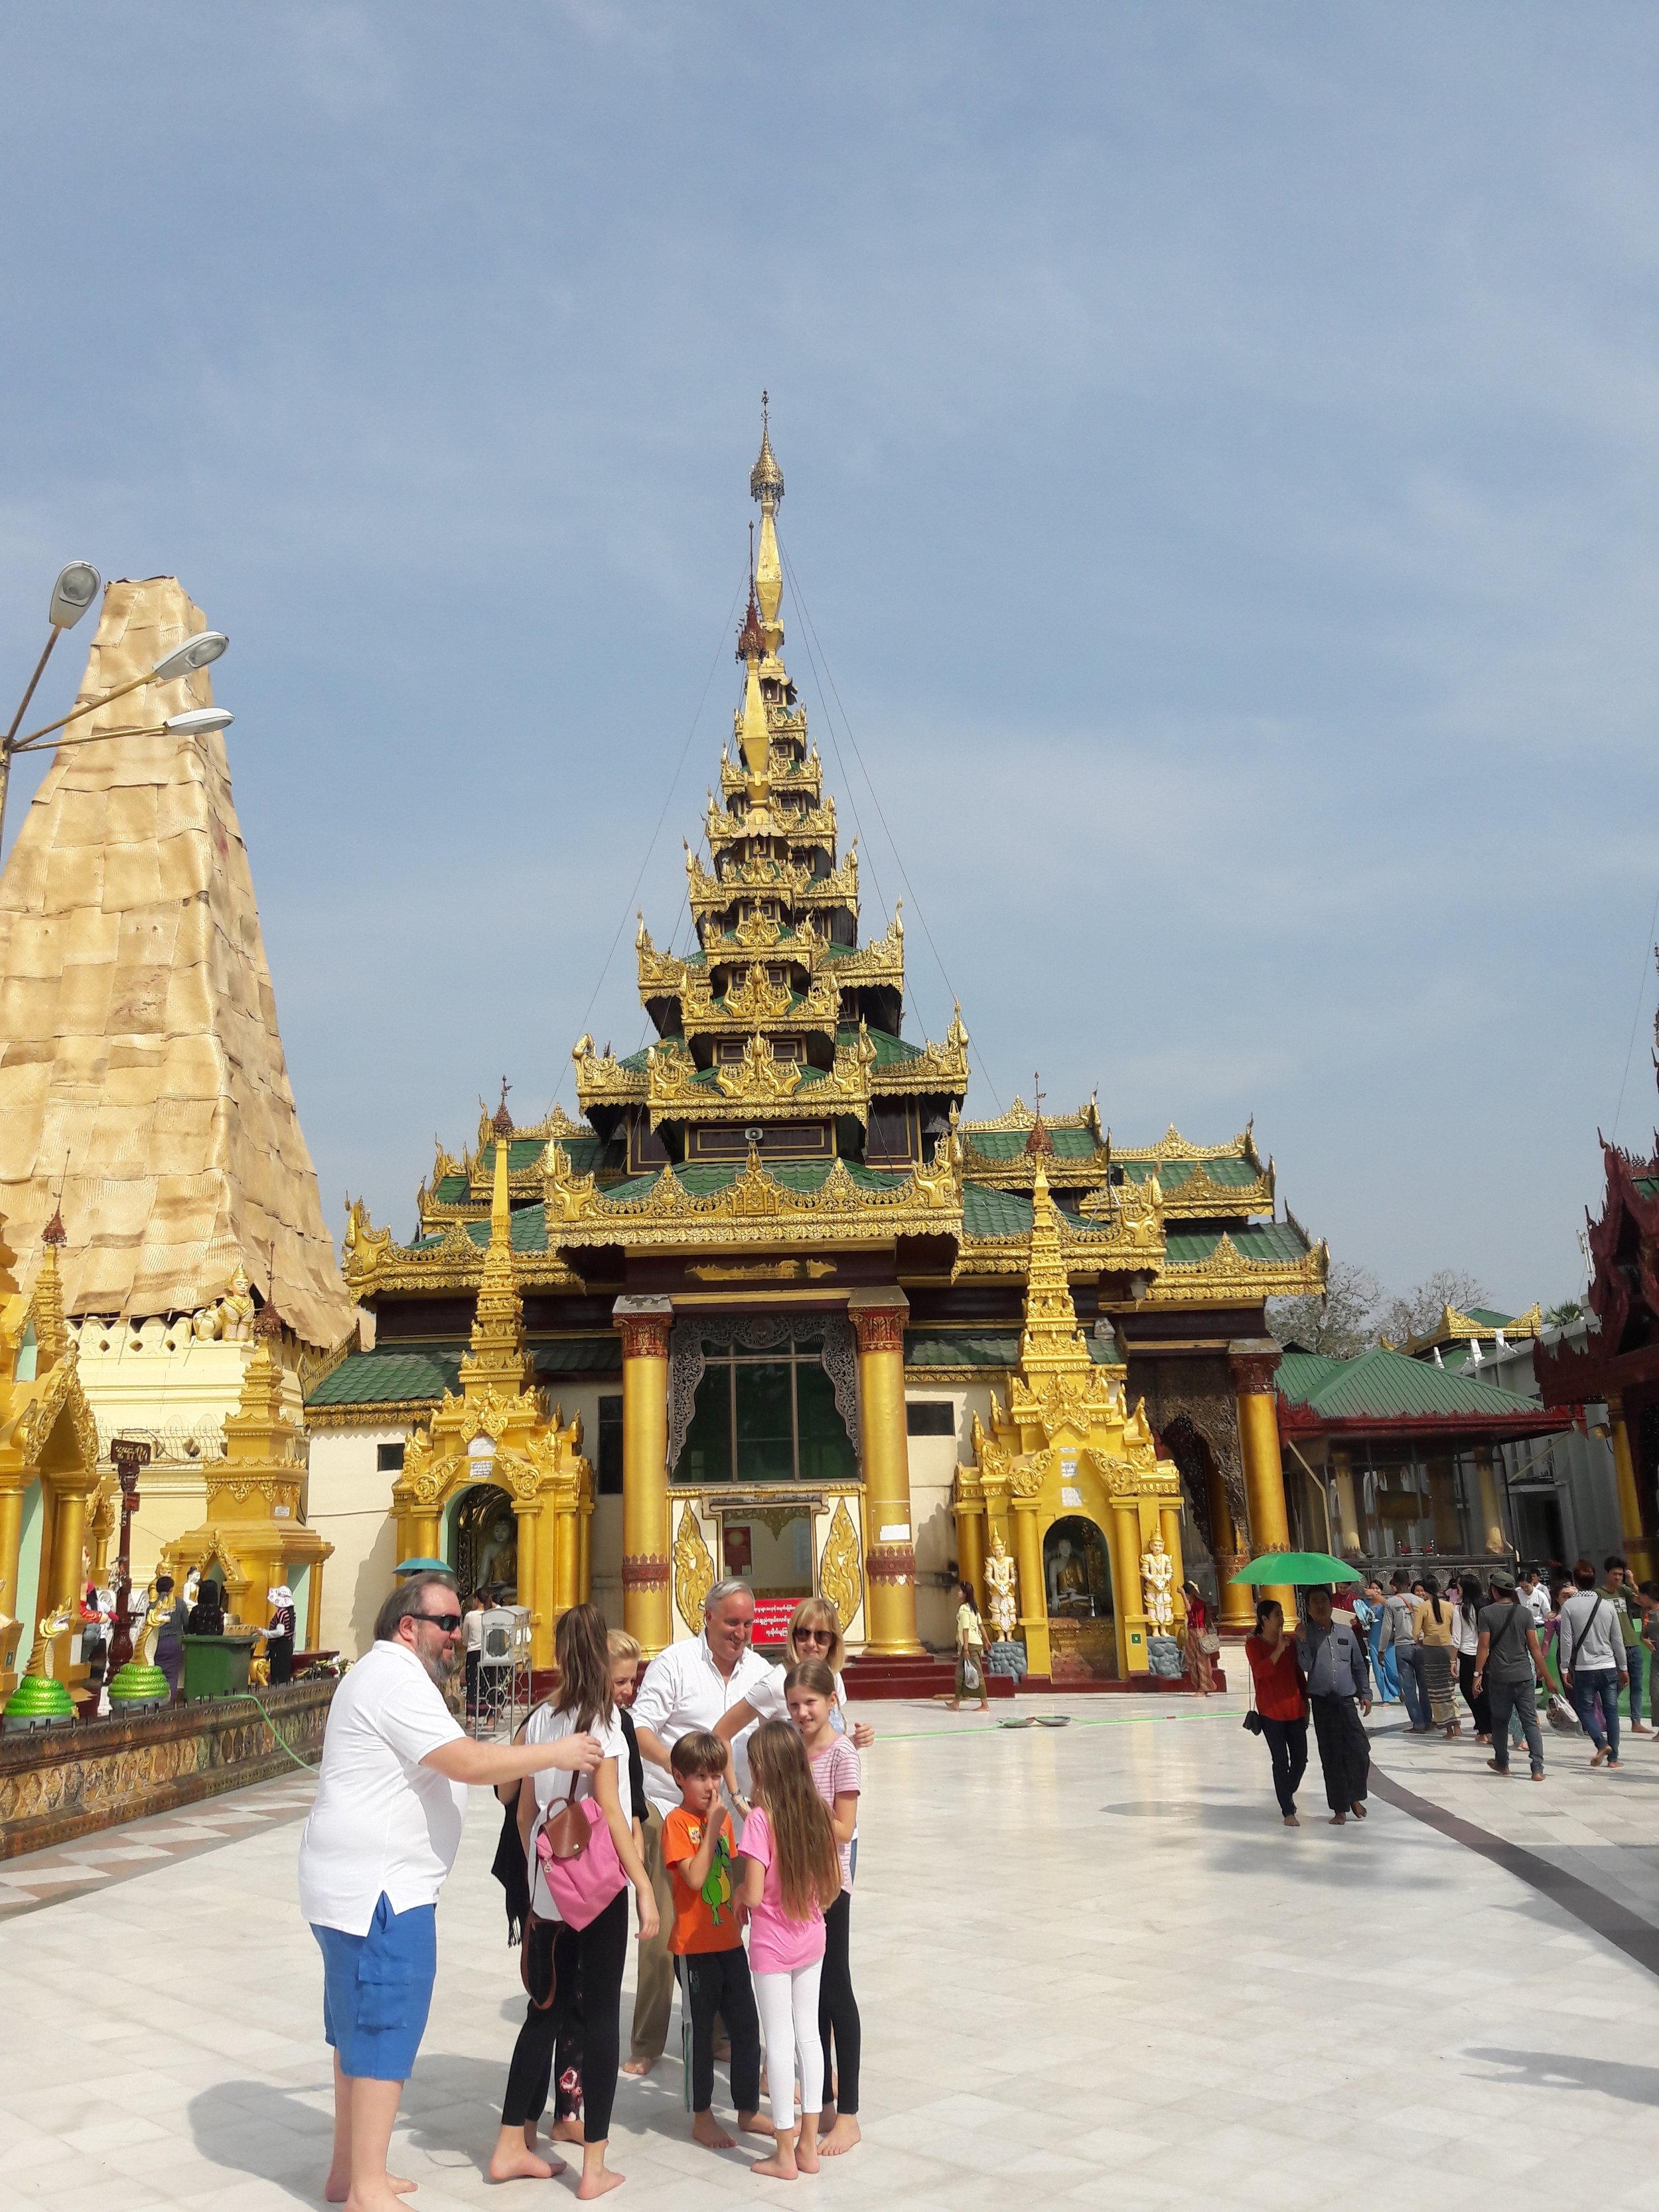 Outside view of the Shwedagon Pagoda in Burma.